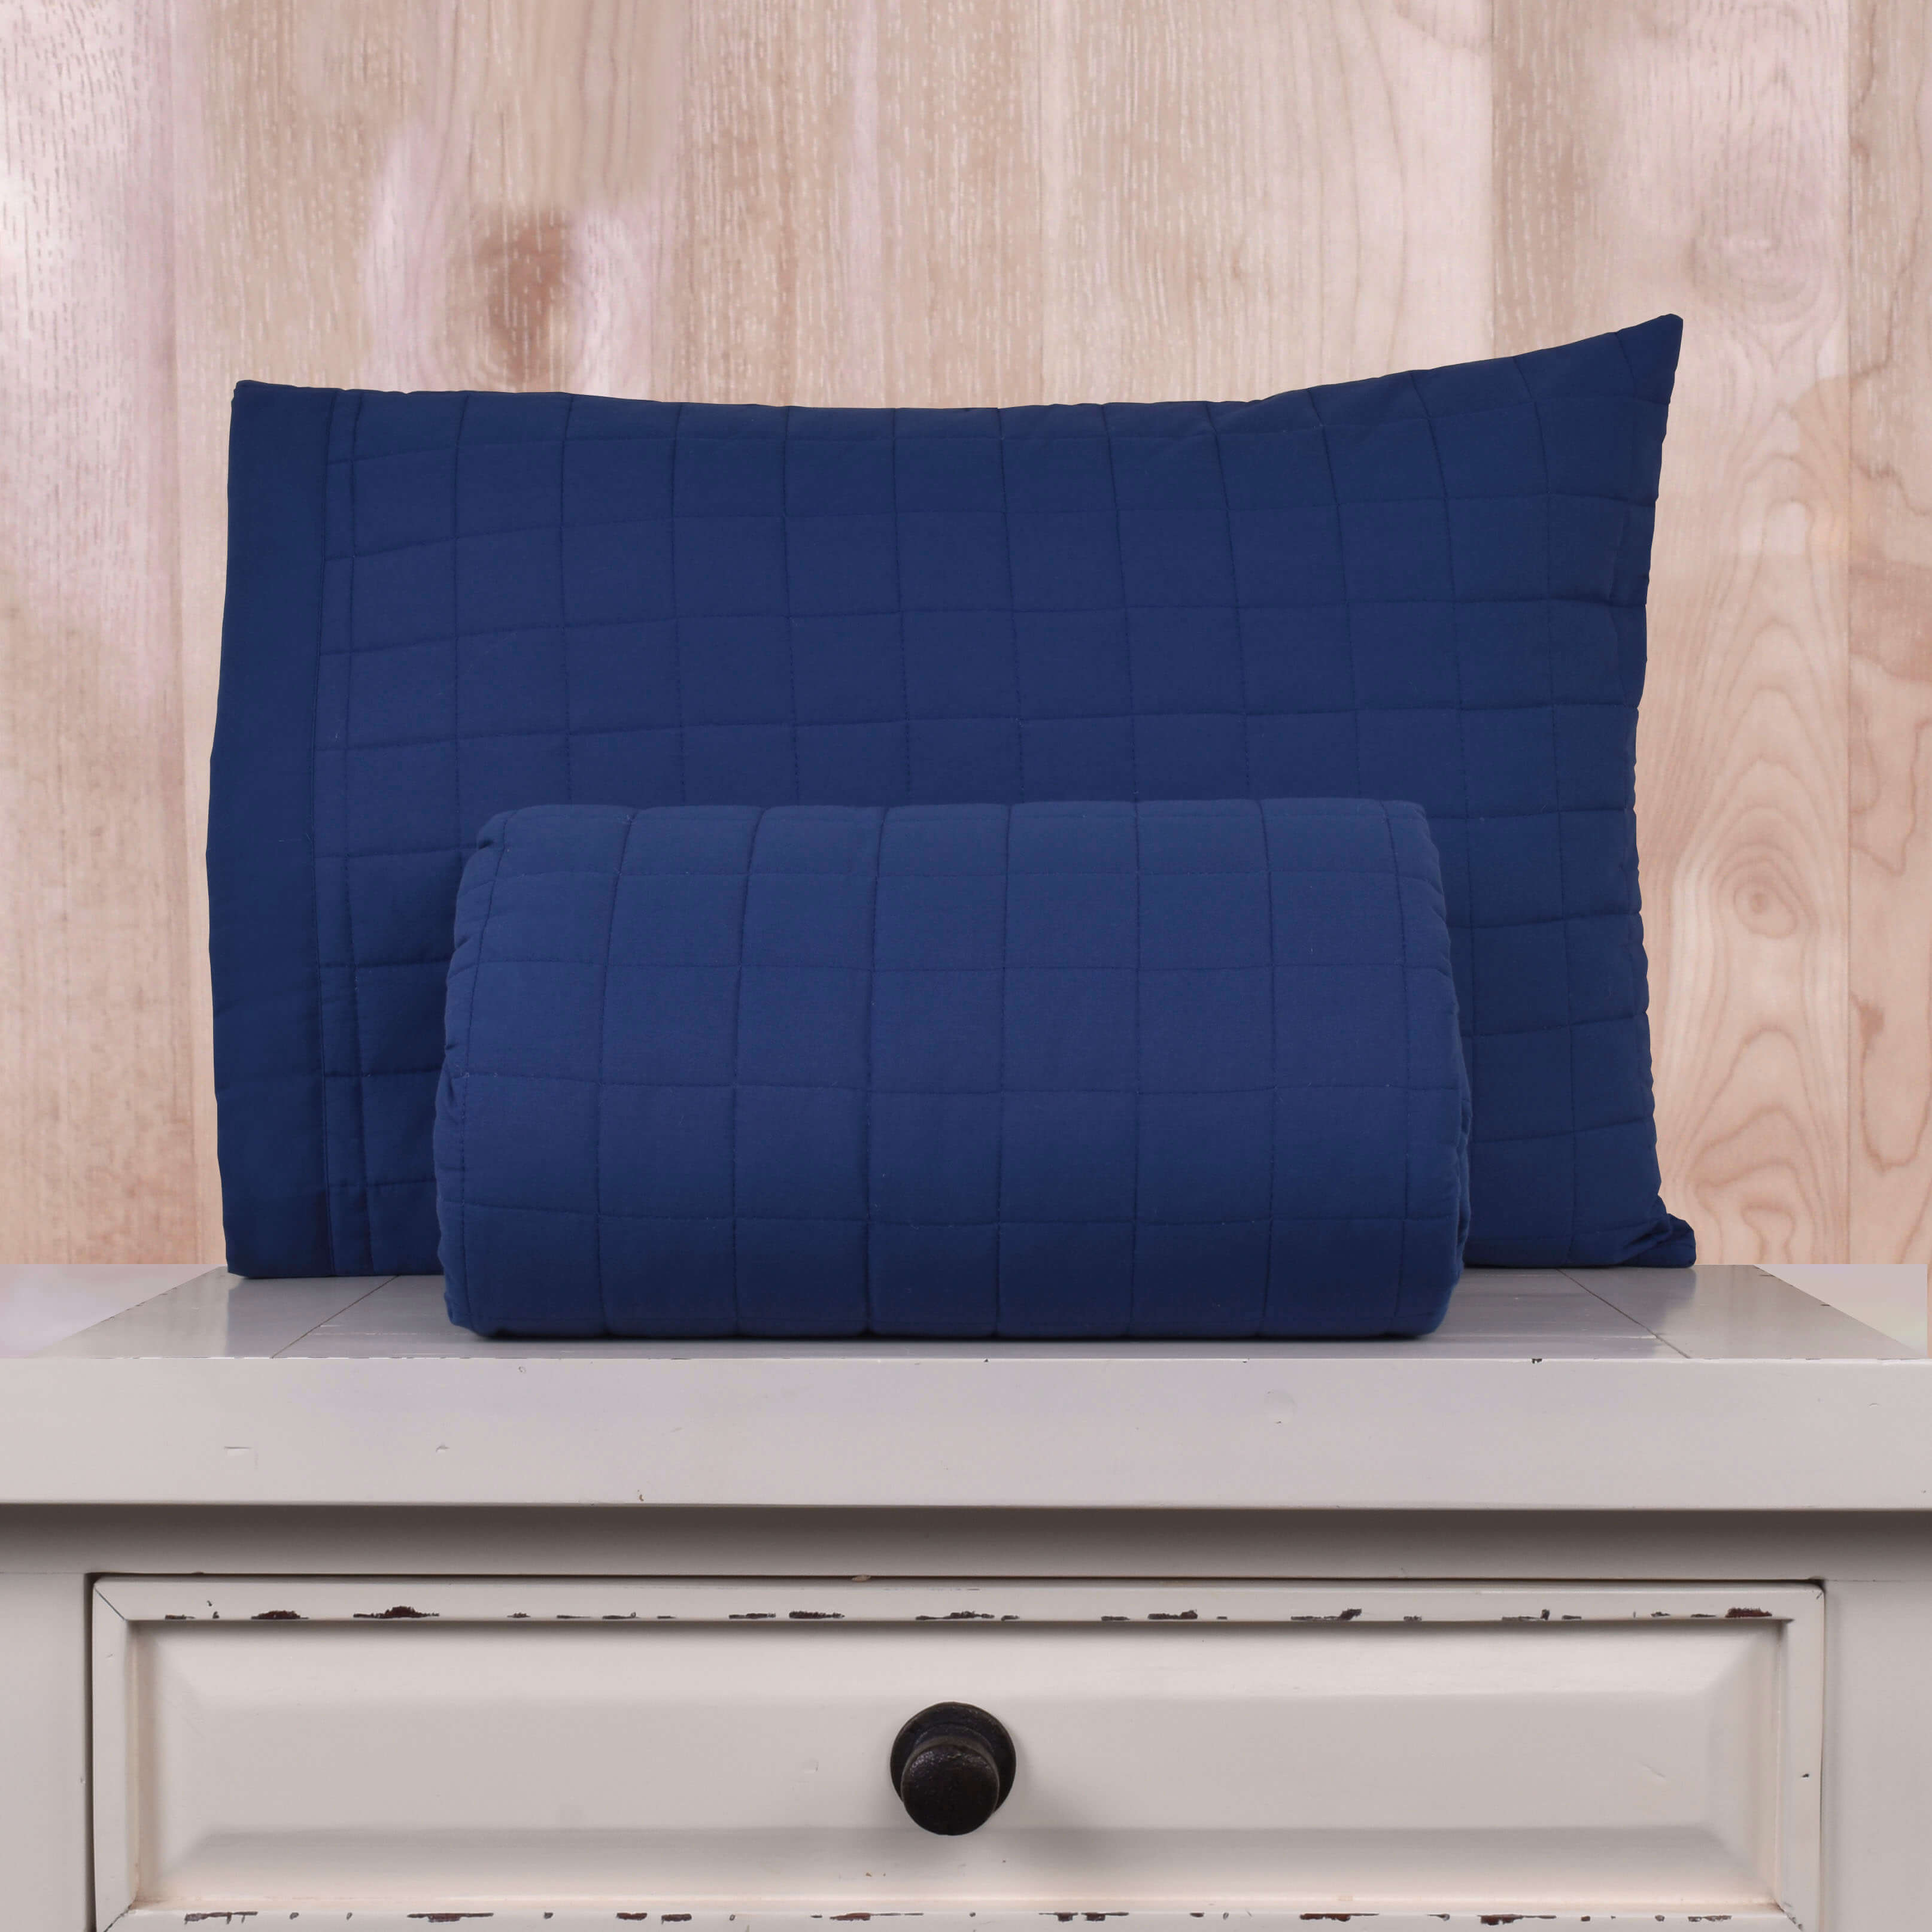 Cubrecama Matelaseado 200 Hilos Basic Colores - Basic Colores / Azul